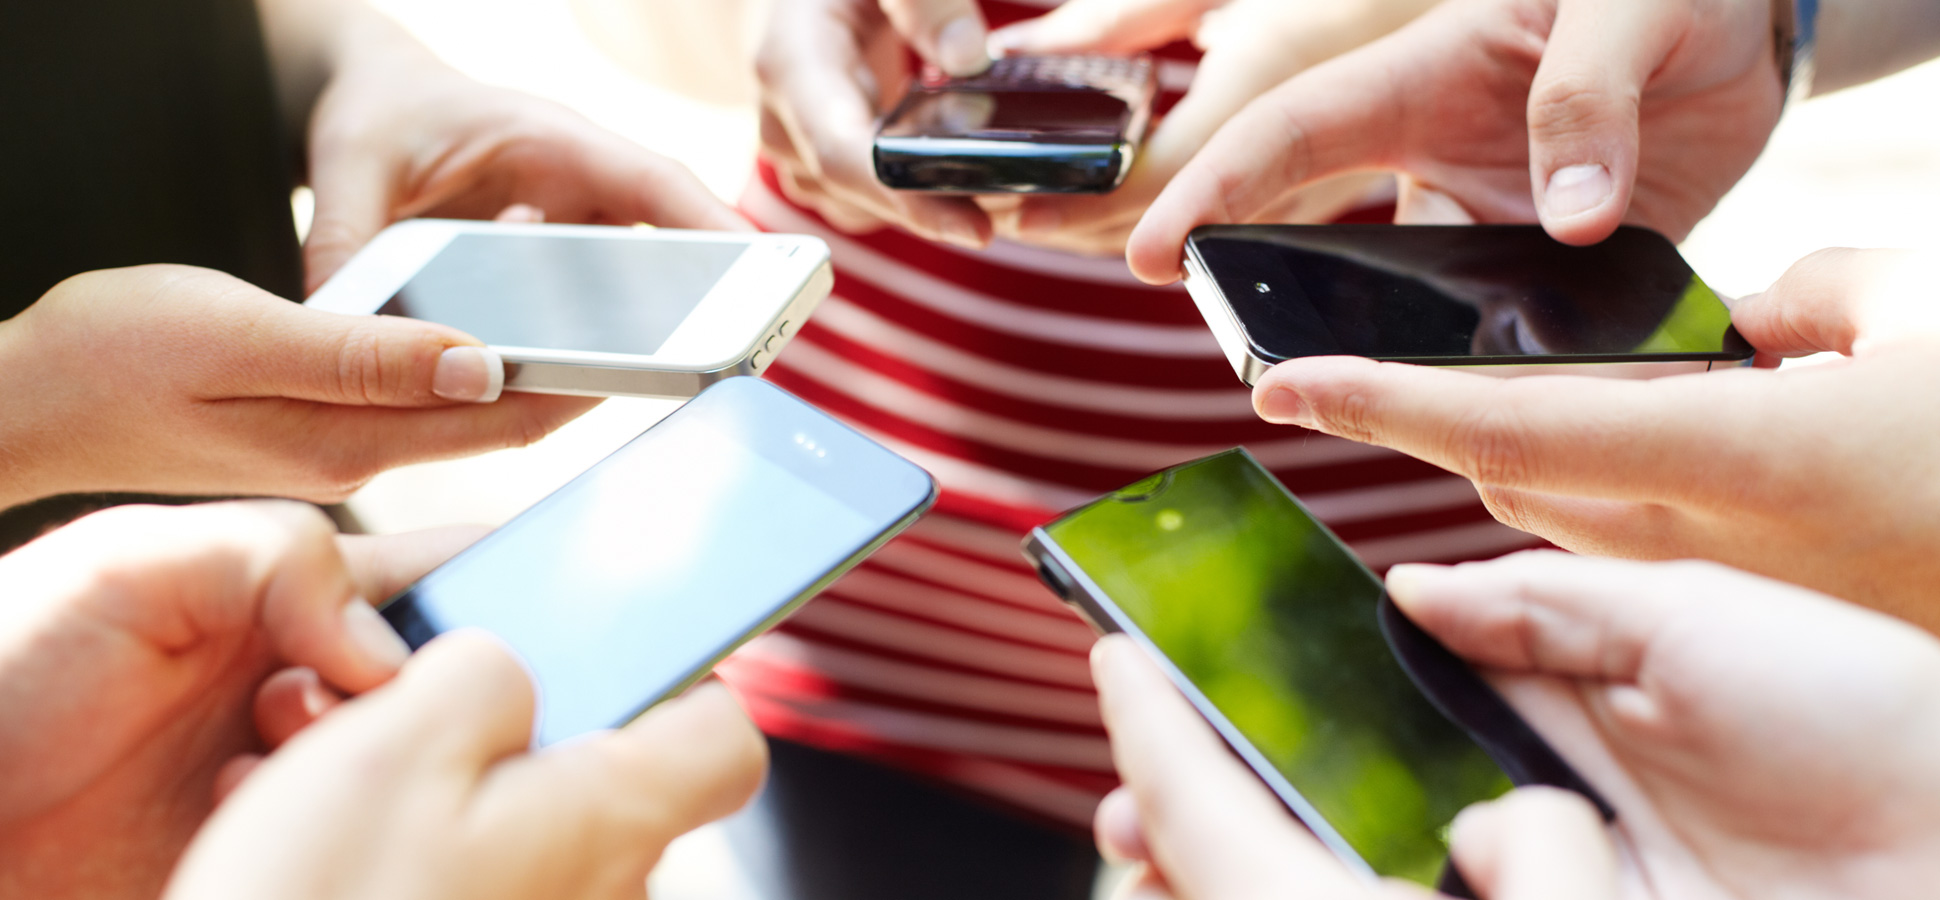 group-of-people-smartphones-1940x900_35714